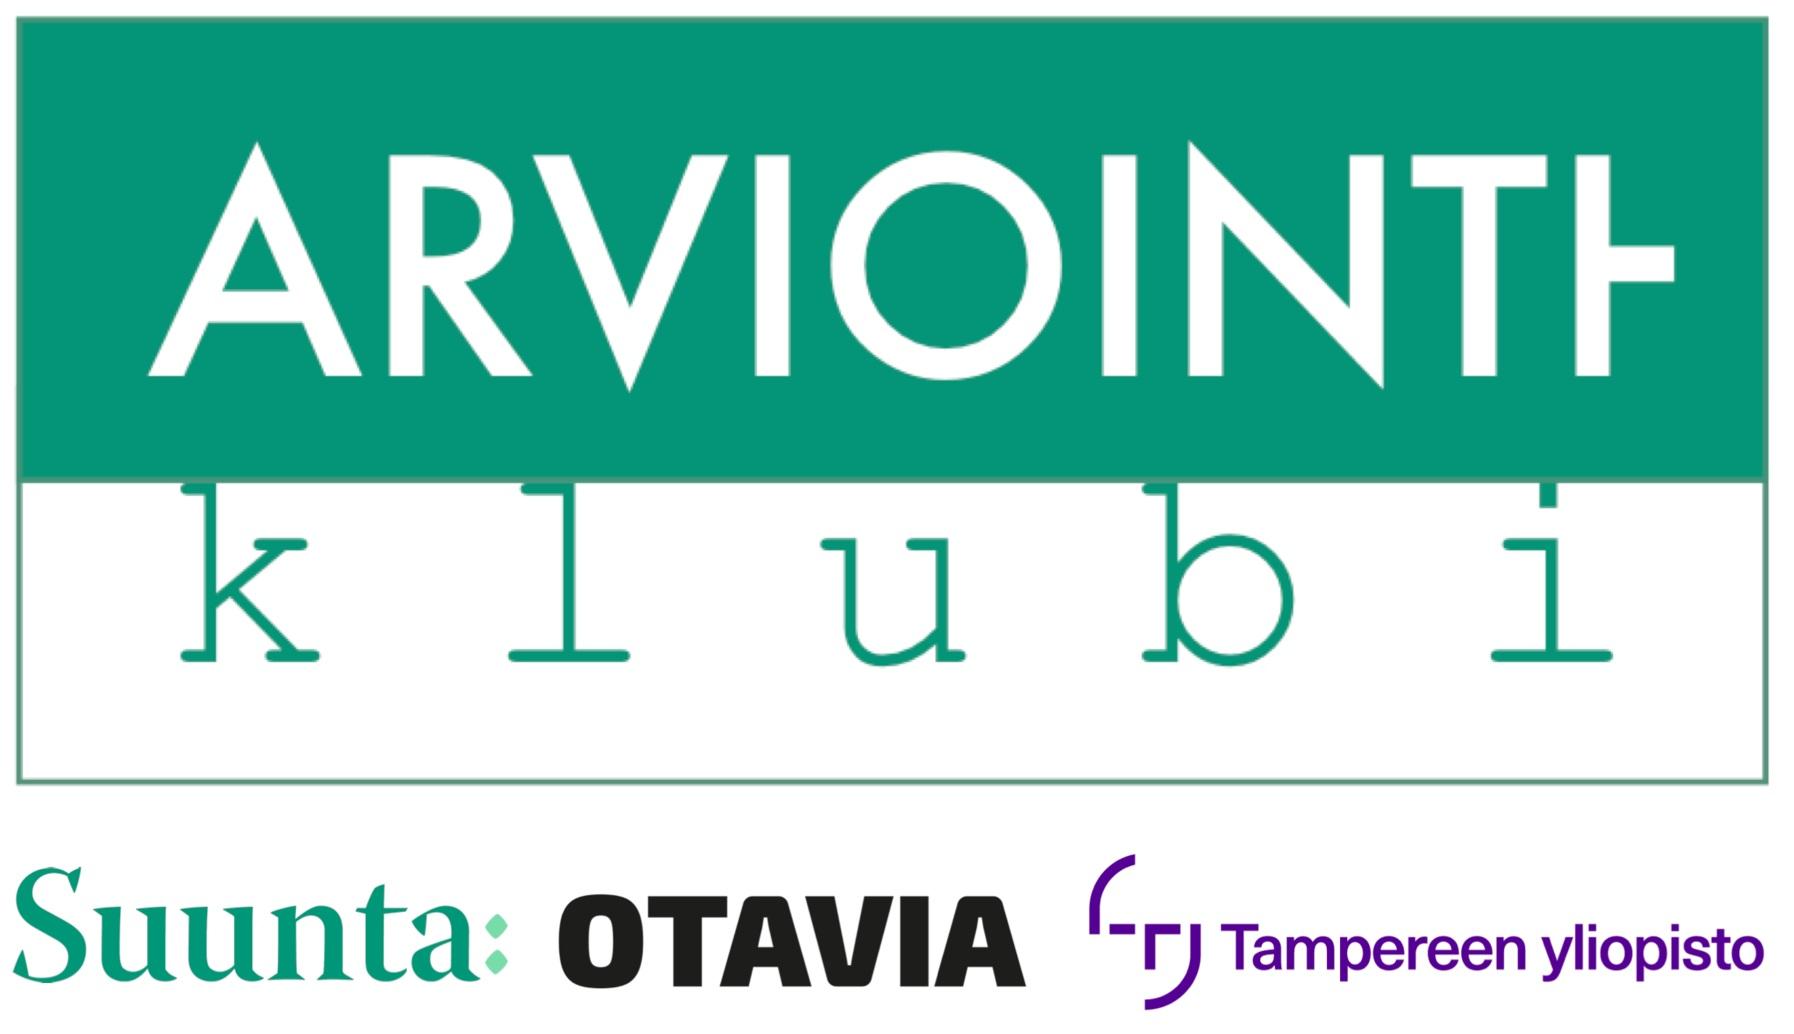 AK+Arviointiklubit+logot+2019+kuva.jpg